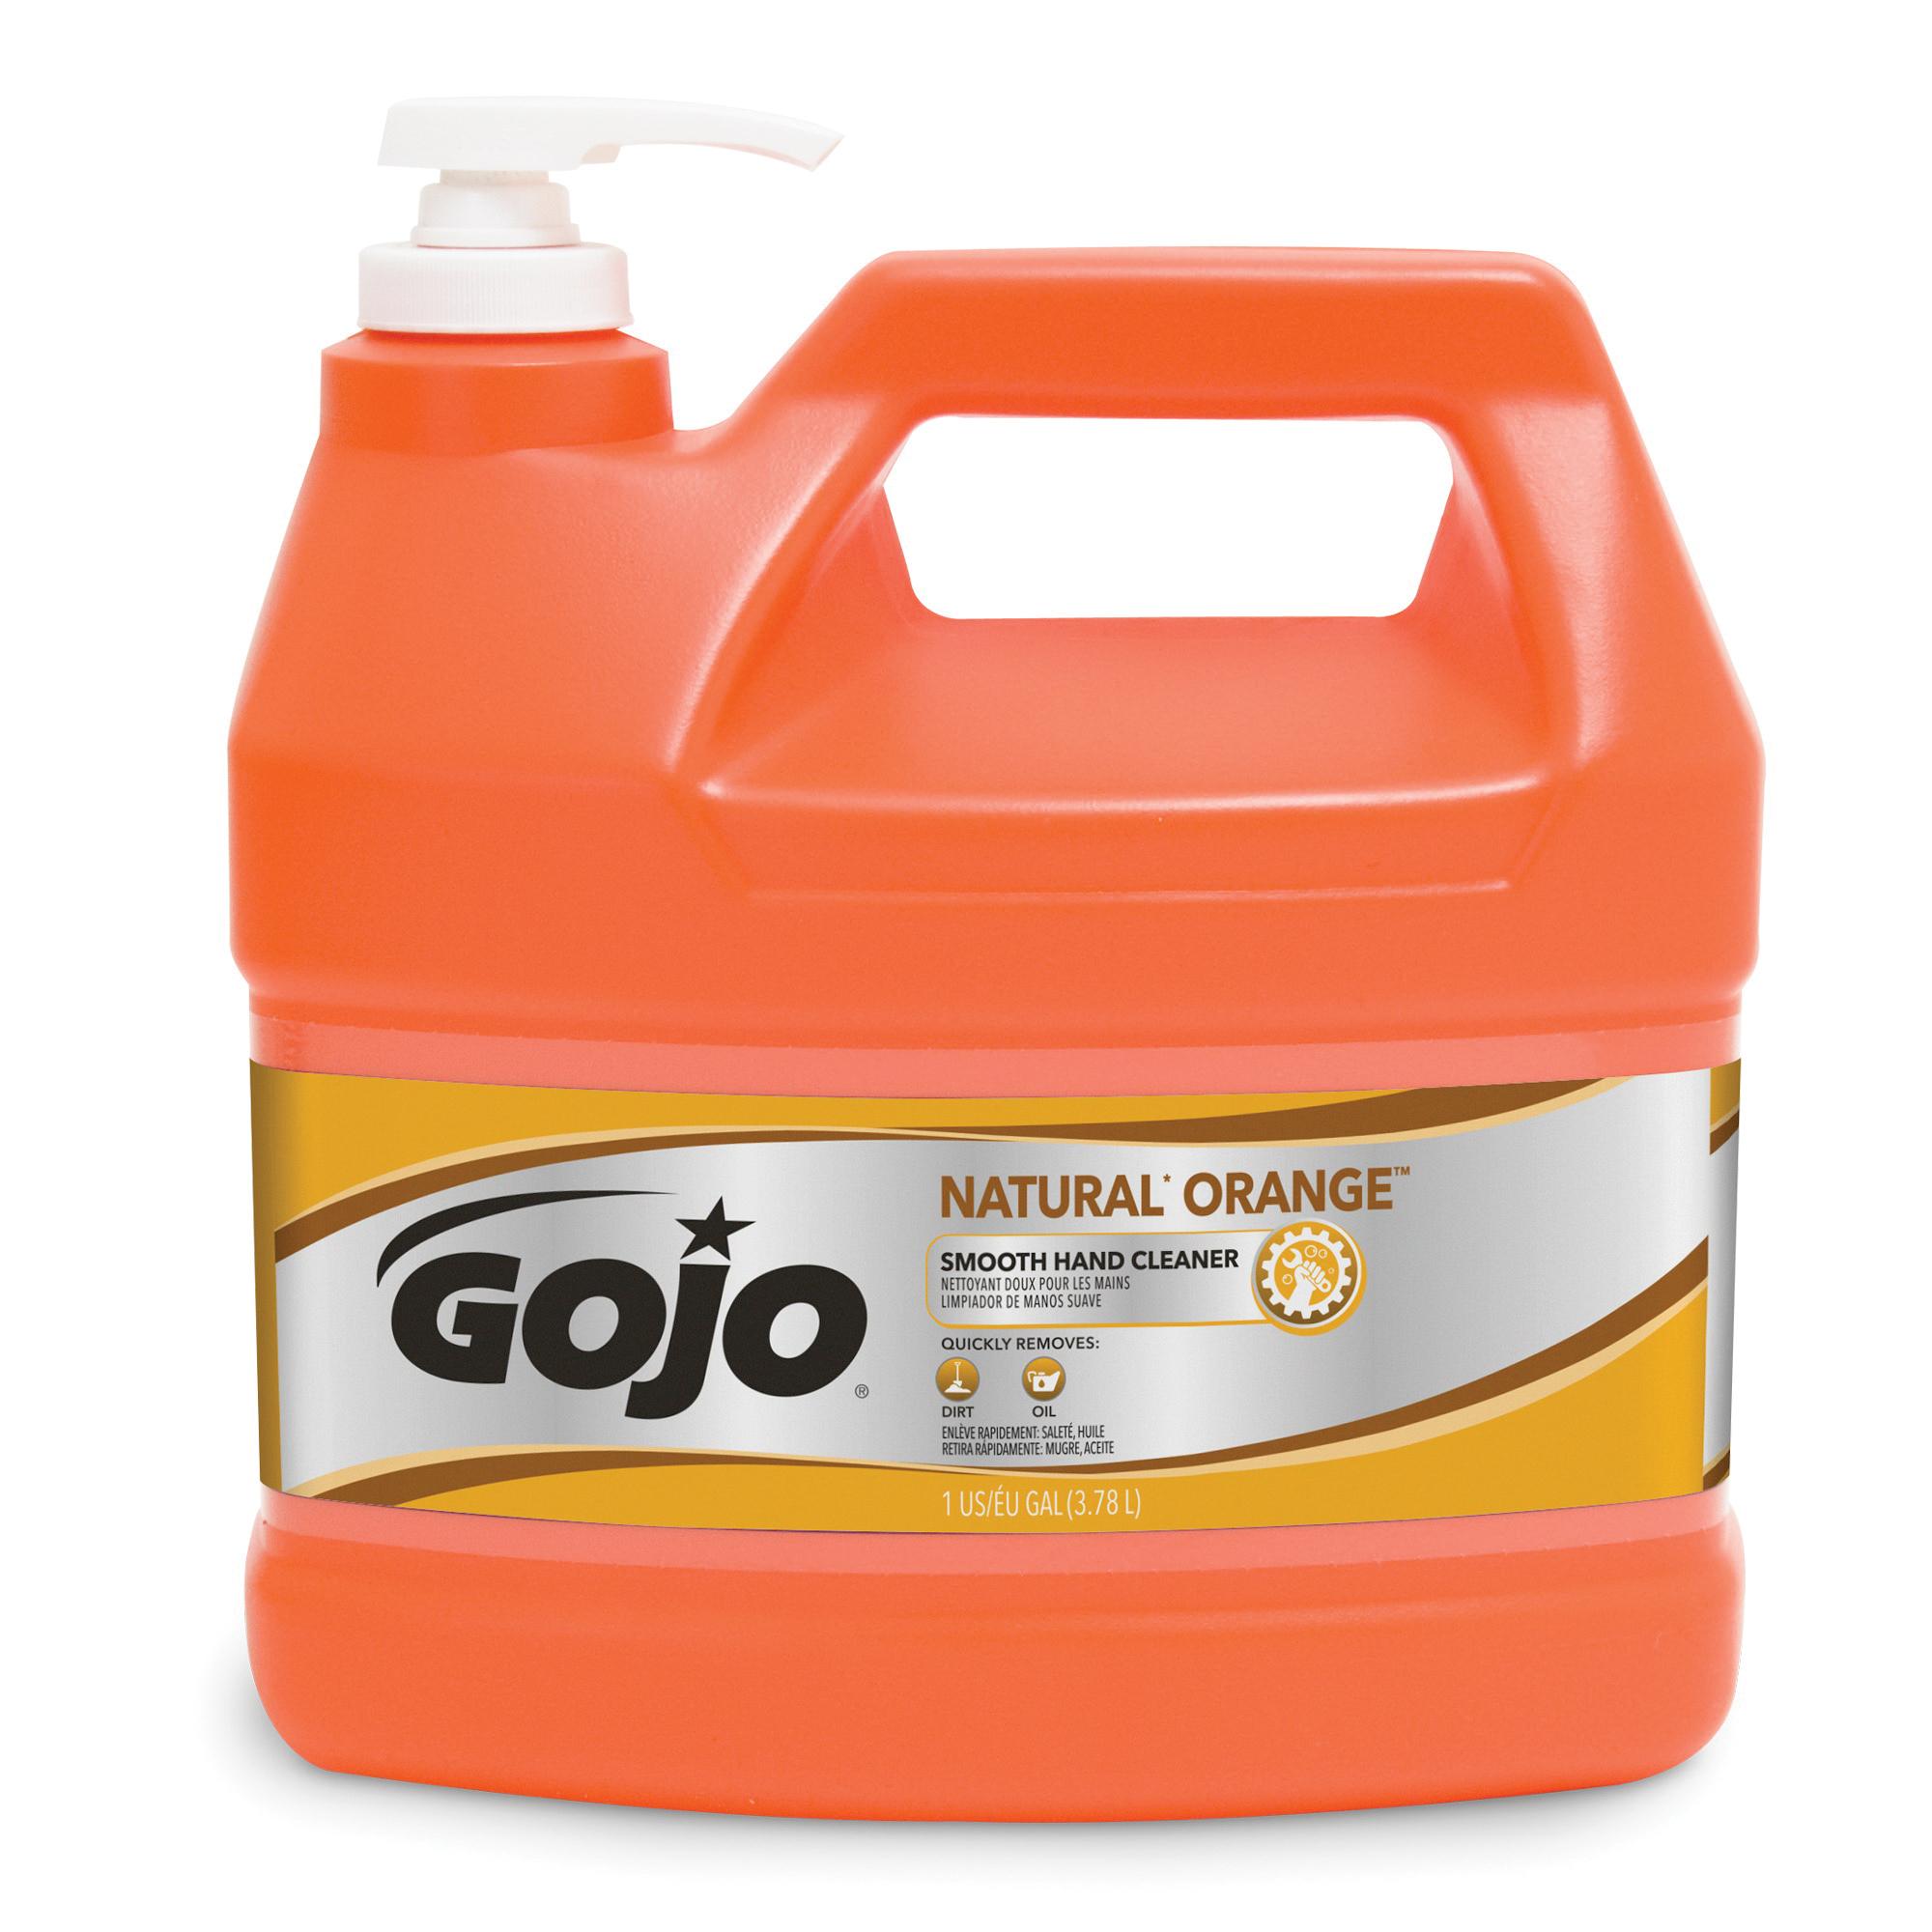 GOJO® 0915-06 Pumice Hand Cleaner, 4.5 lb, Plastic Cartridge, Liquid, Fresh Lemon, Opaque Green